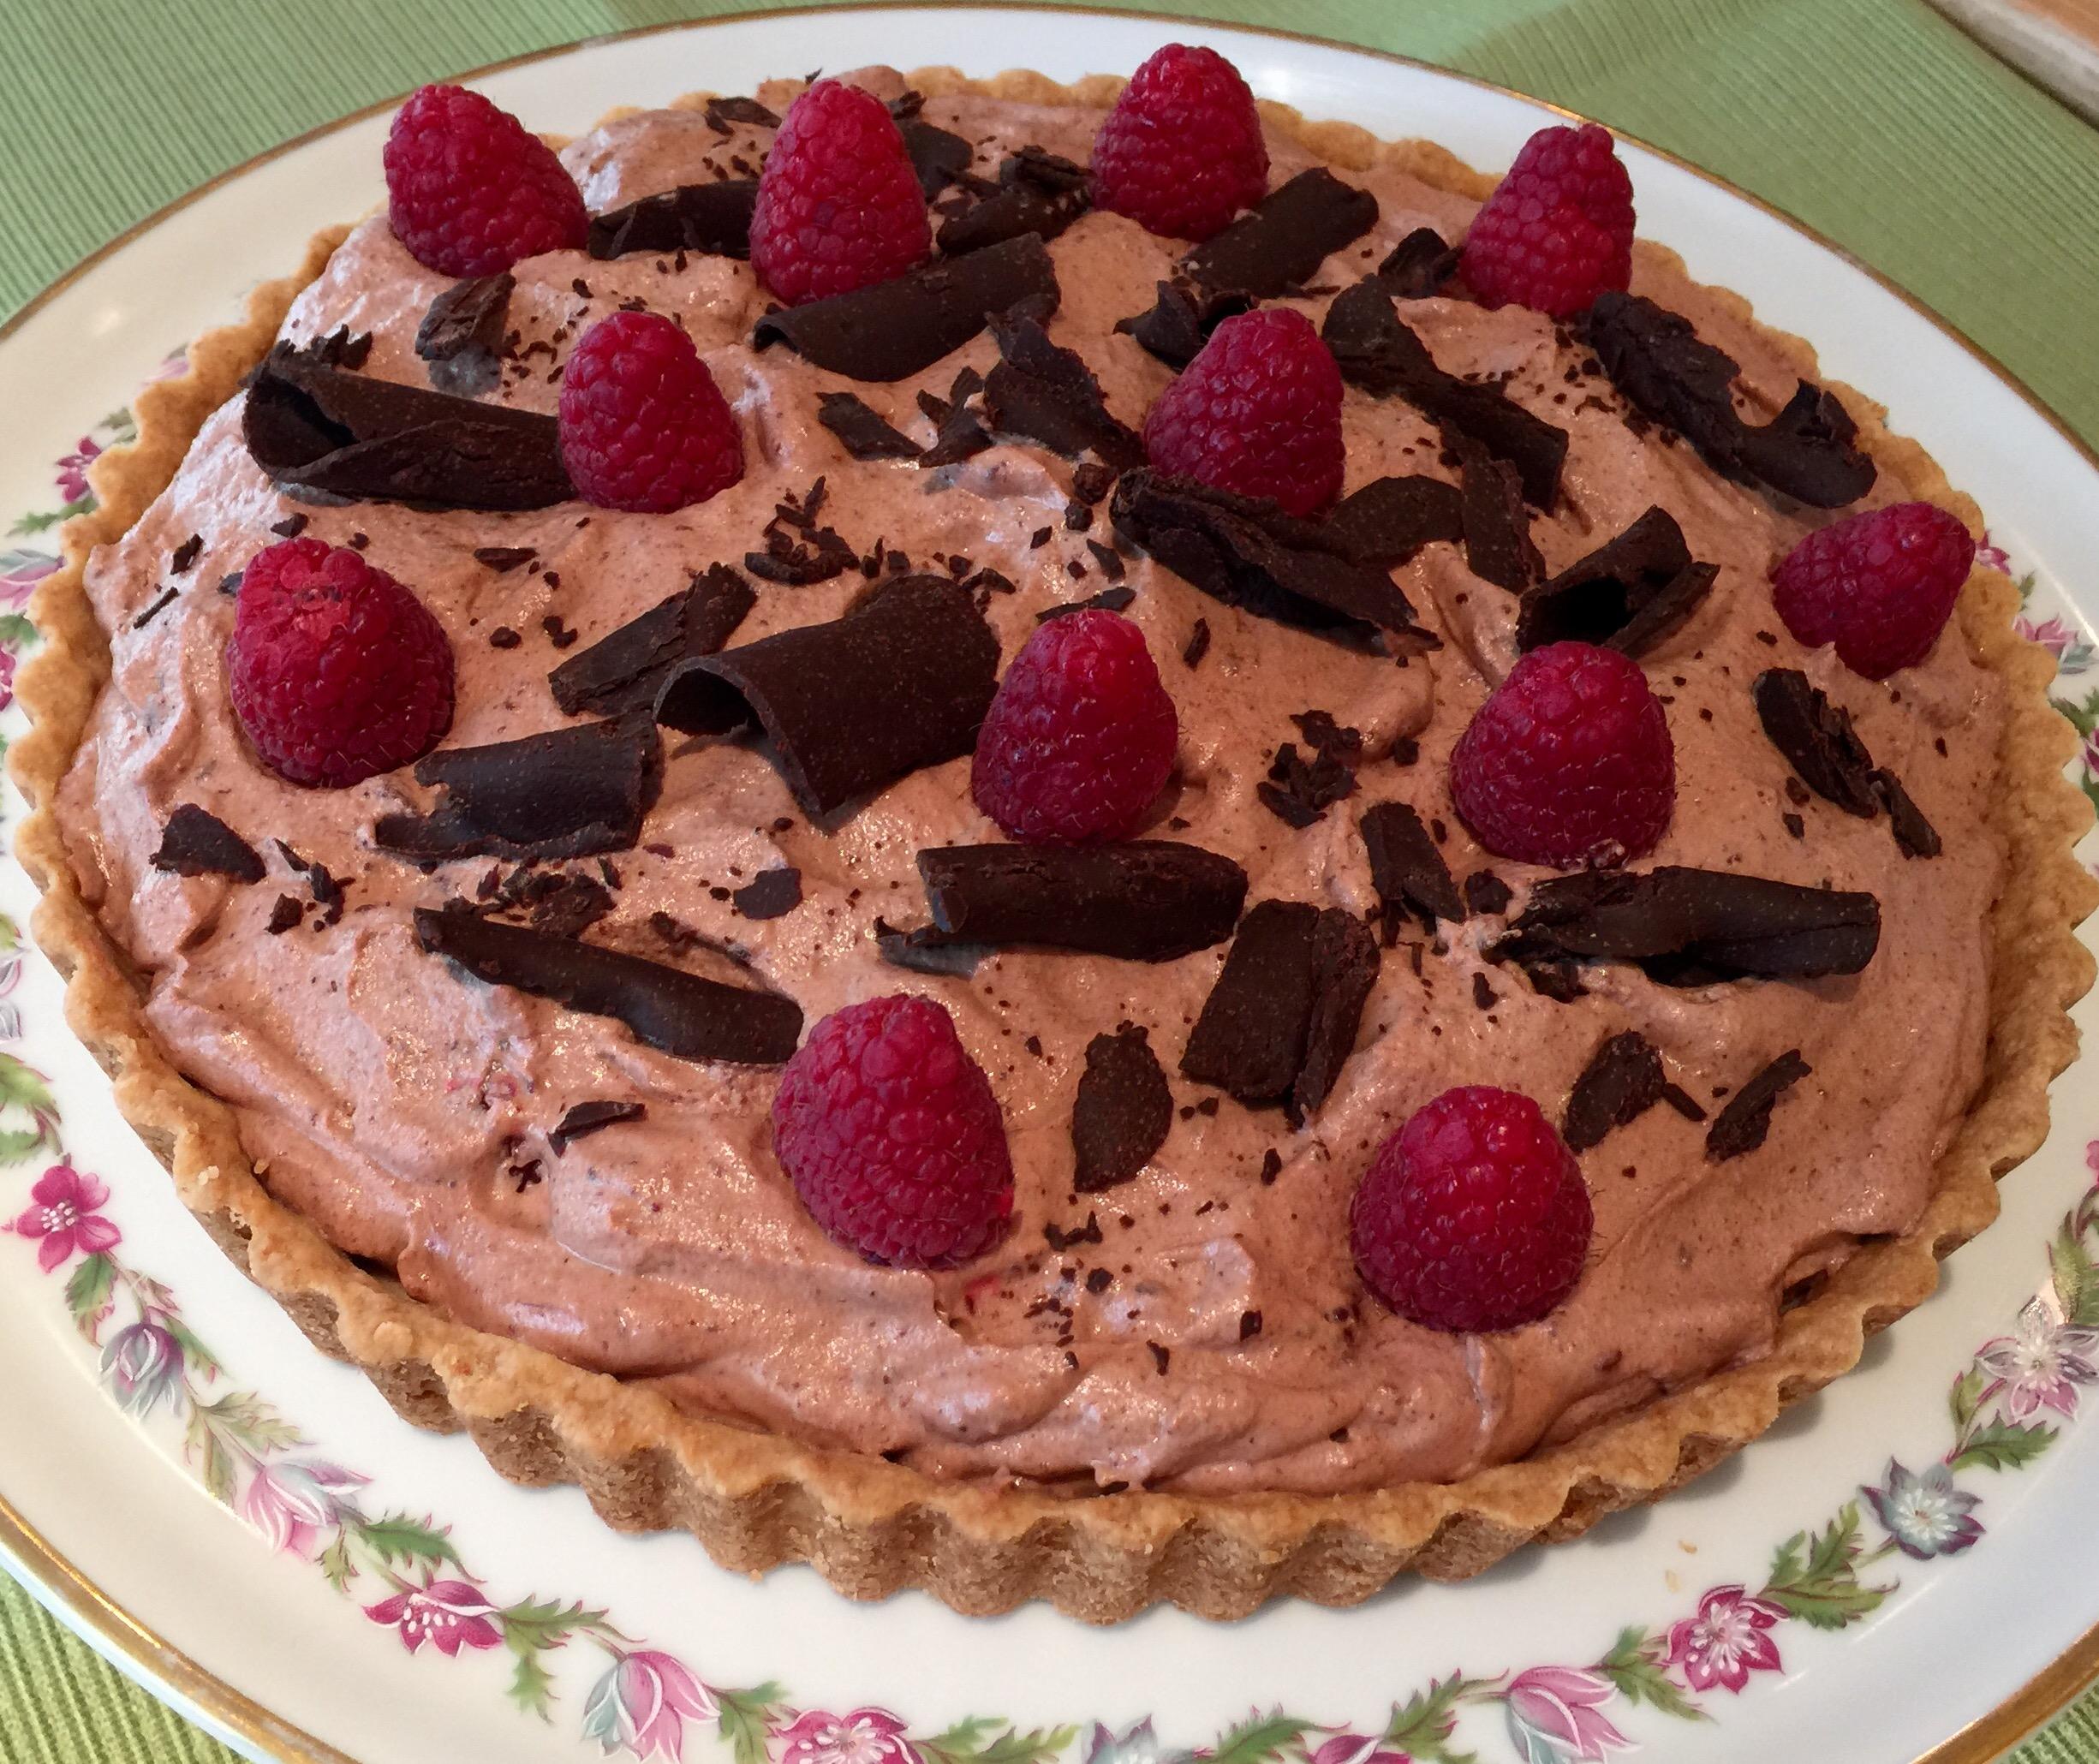 Chocolate Raspberry Chantilly Tart